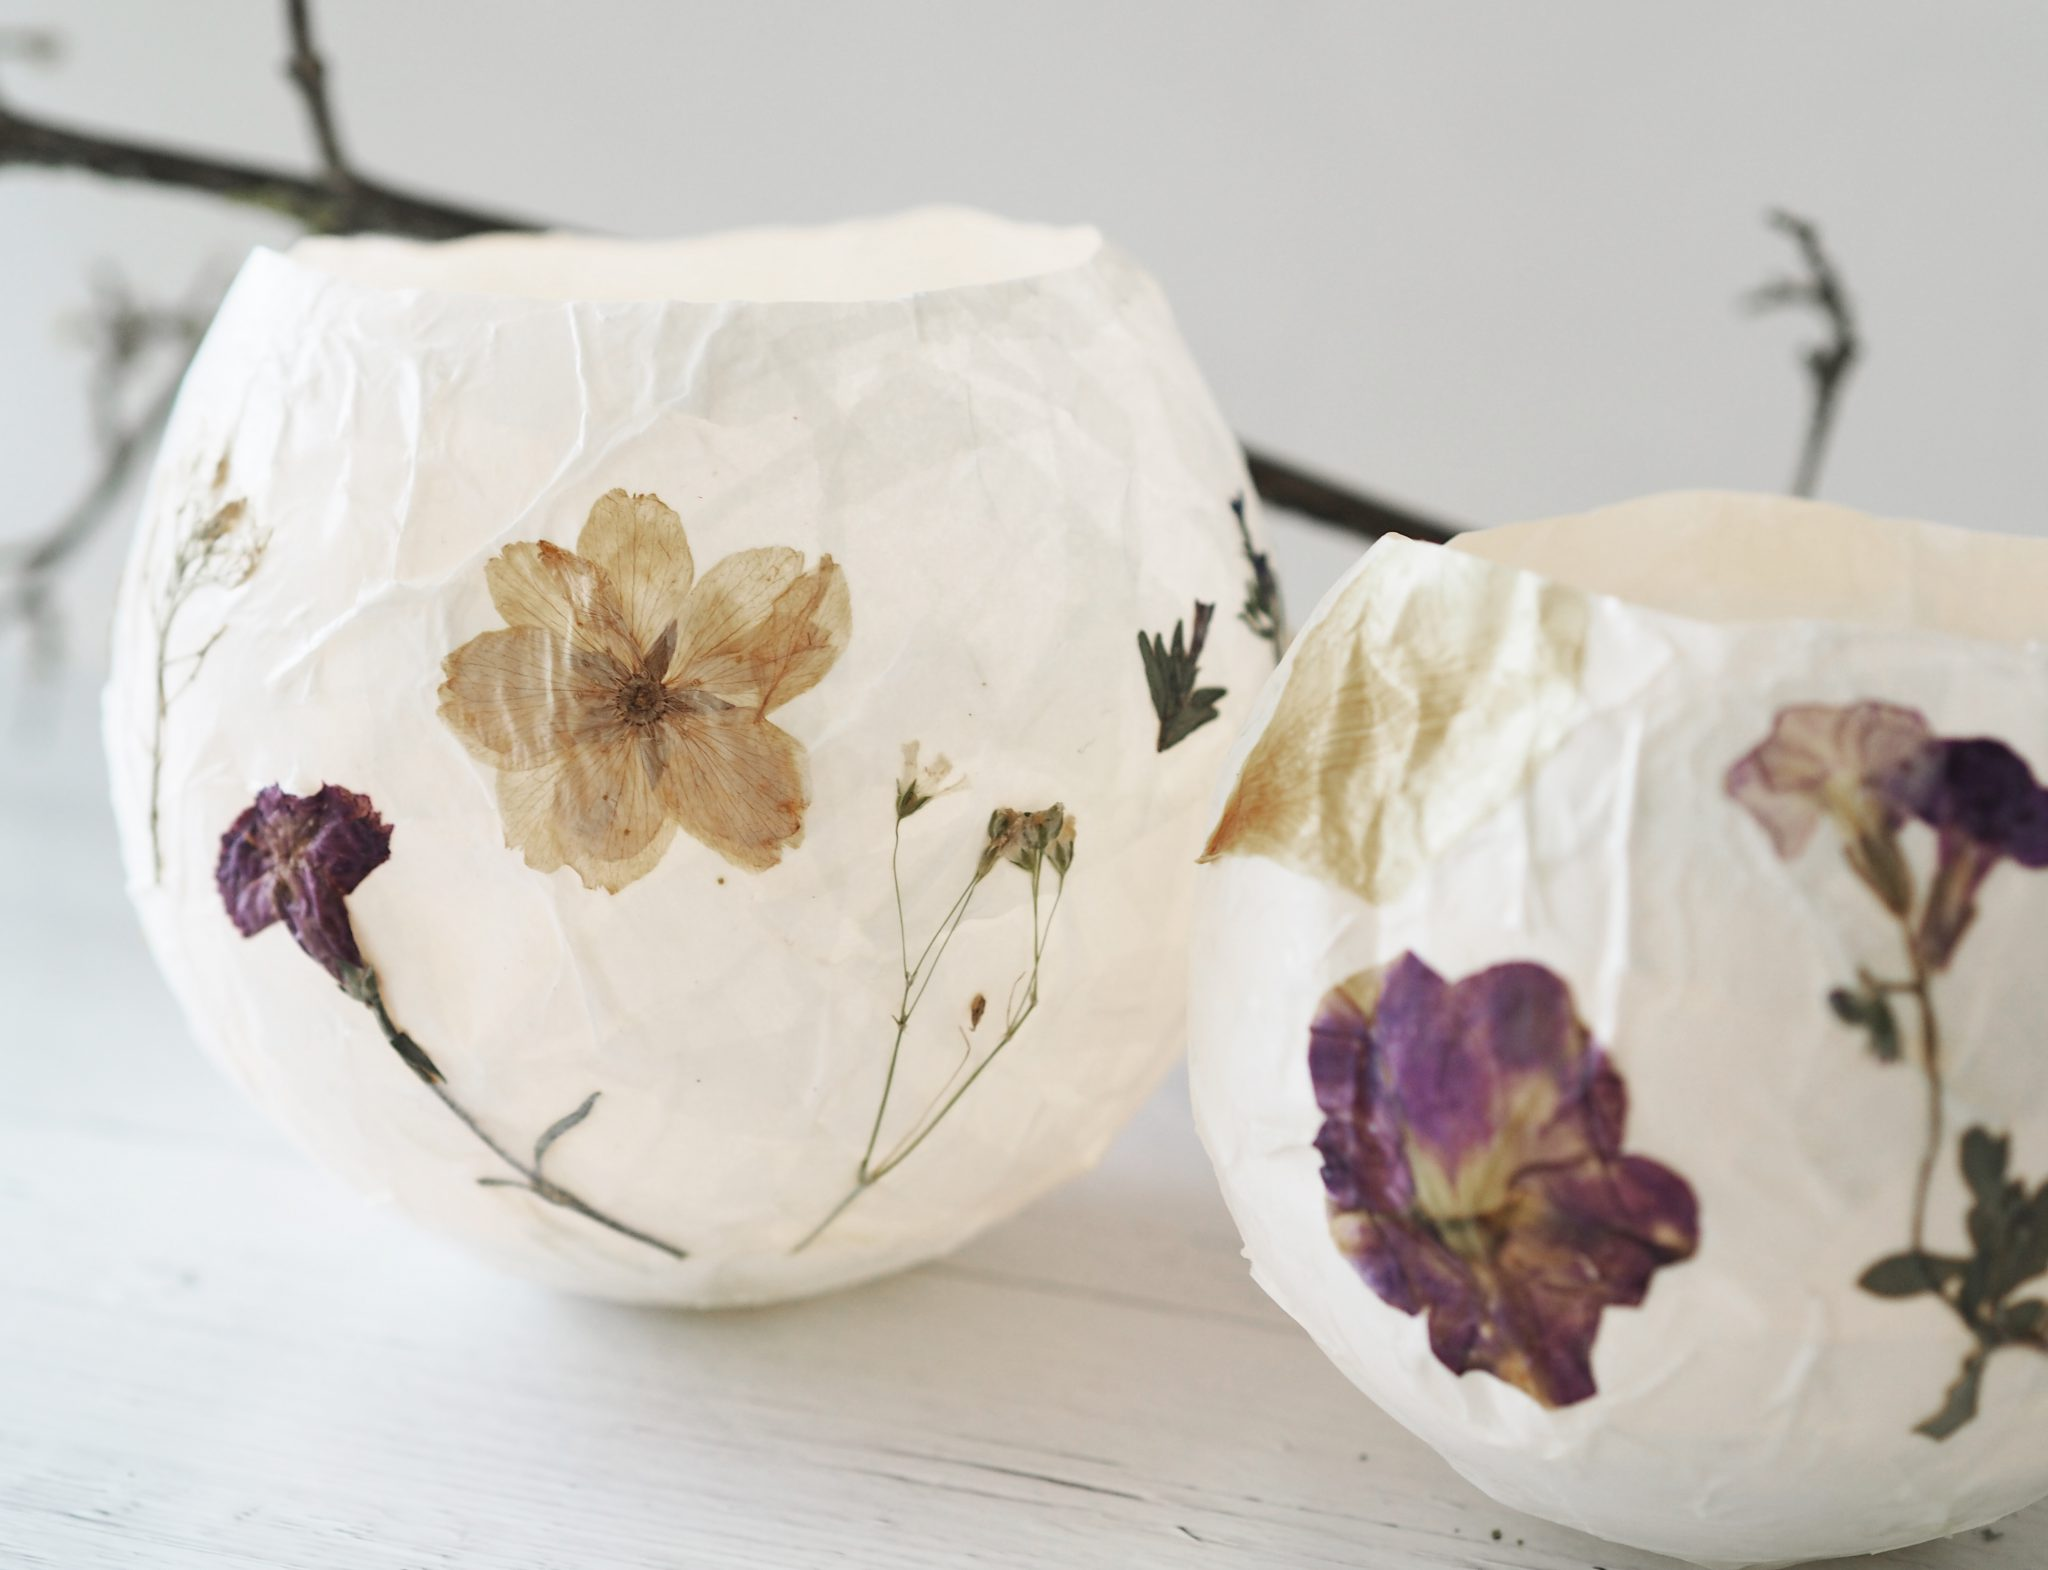 P6250296 - Selbstgemachte Lampions mit getrockneten Blüten